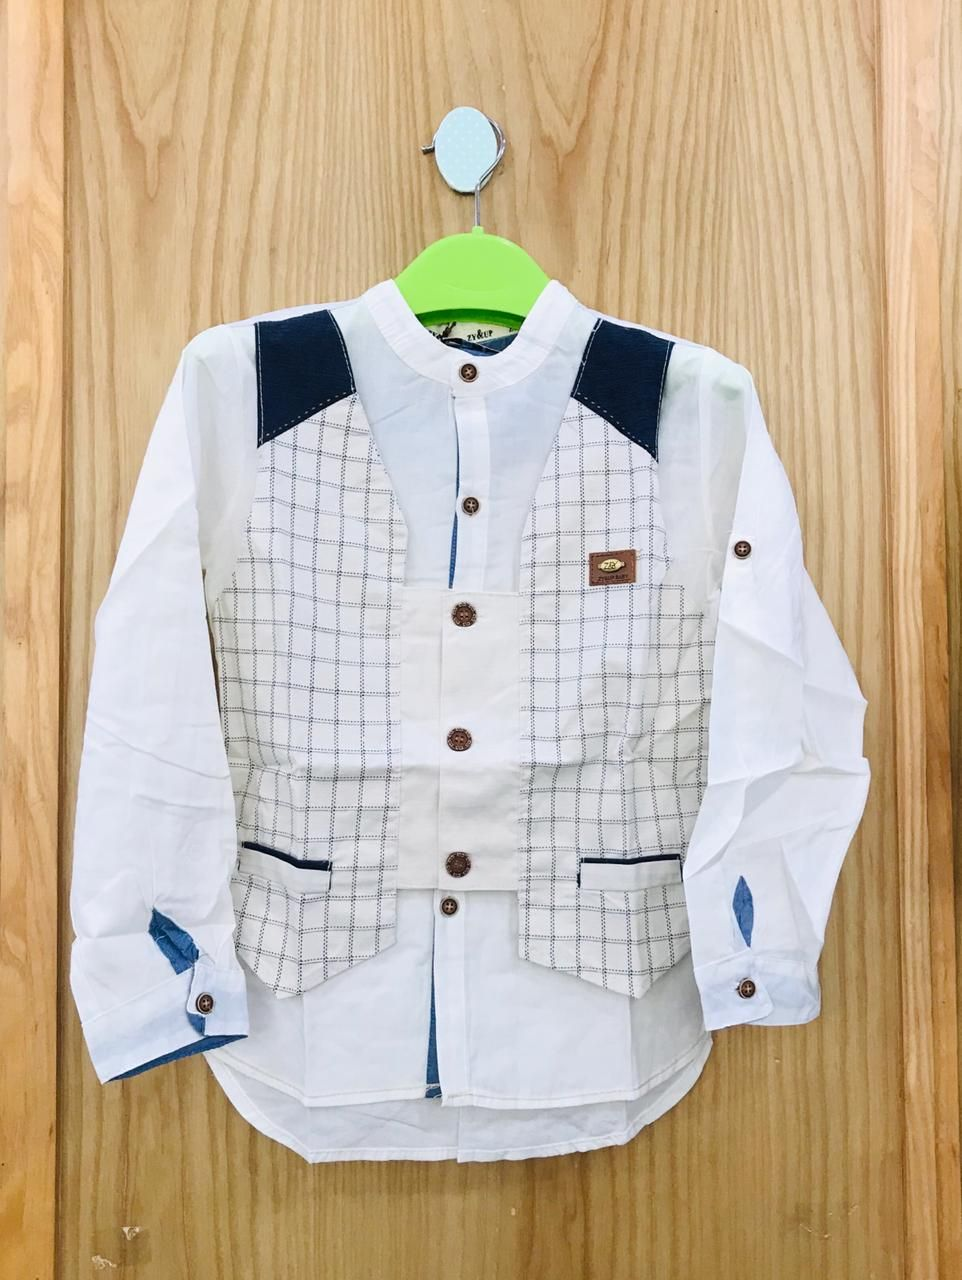 Boys Linen Shirt Boys Long Sleeve Shirts White Linen Dress Shirts White Long Sleeve Shirts Linen Boys Outfit Boys Shirts Linen Top Boys Linen Shirt Boys Long Sleeve Shirts Boy Outfits [ 1875 x 1500 Pixel ]